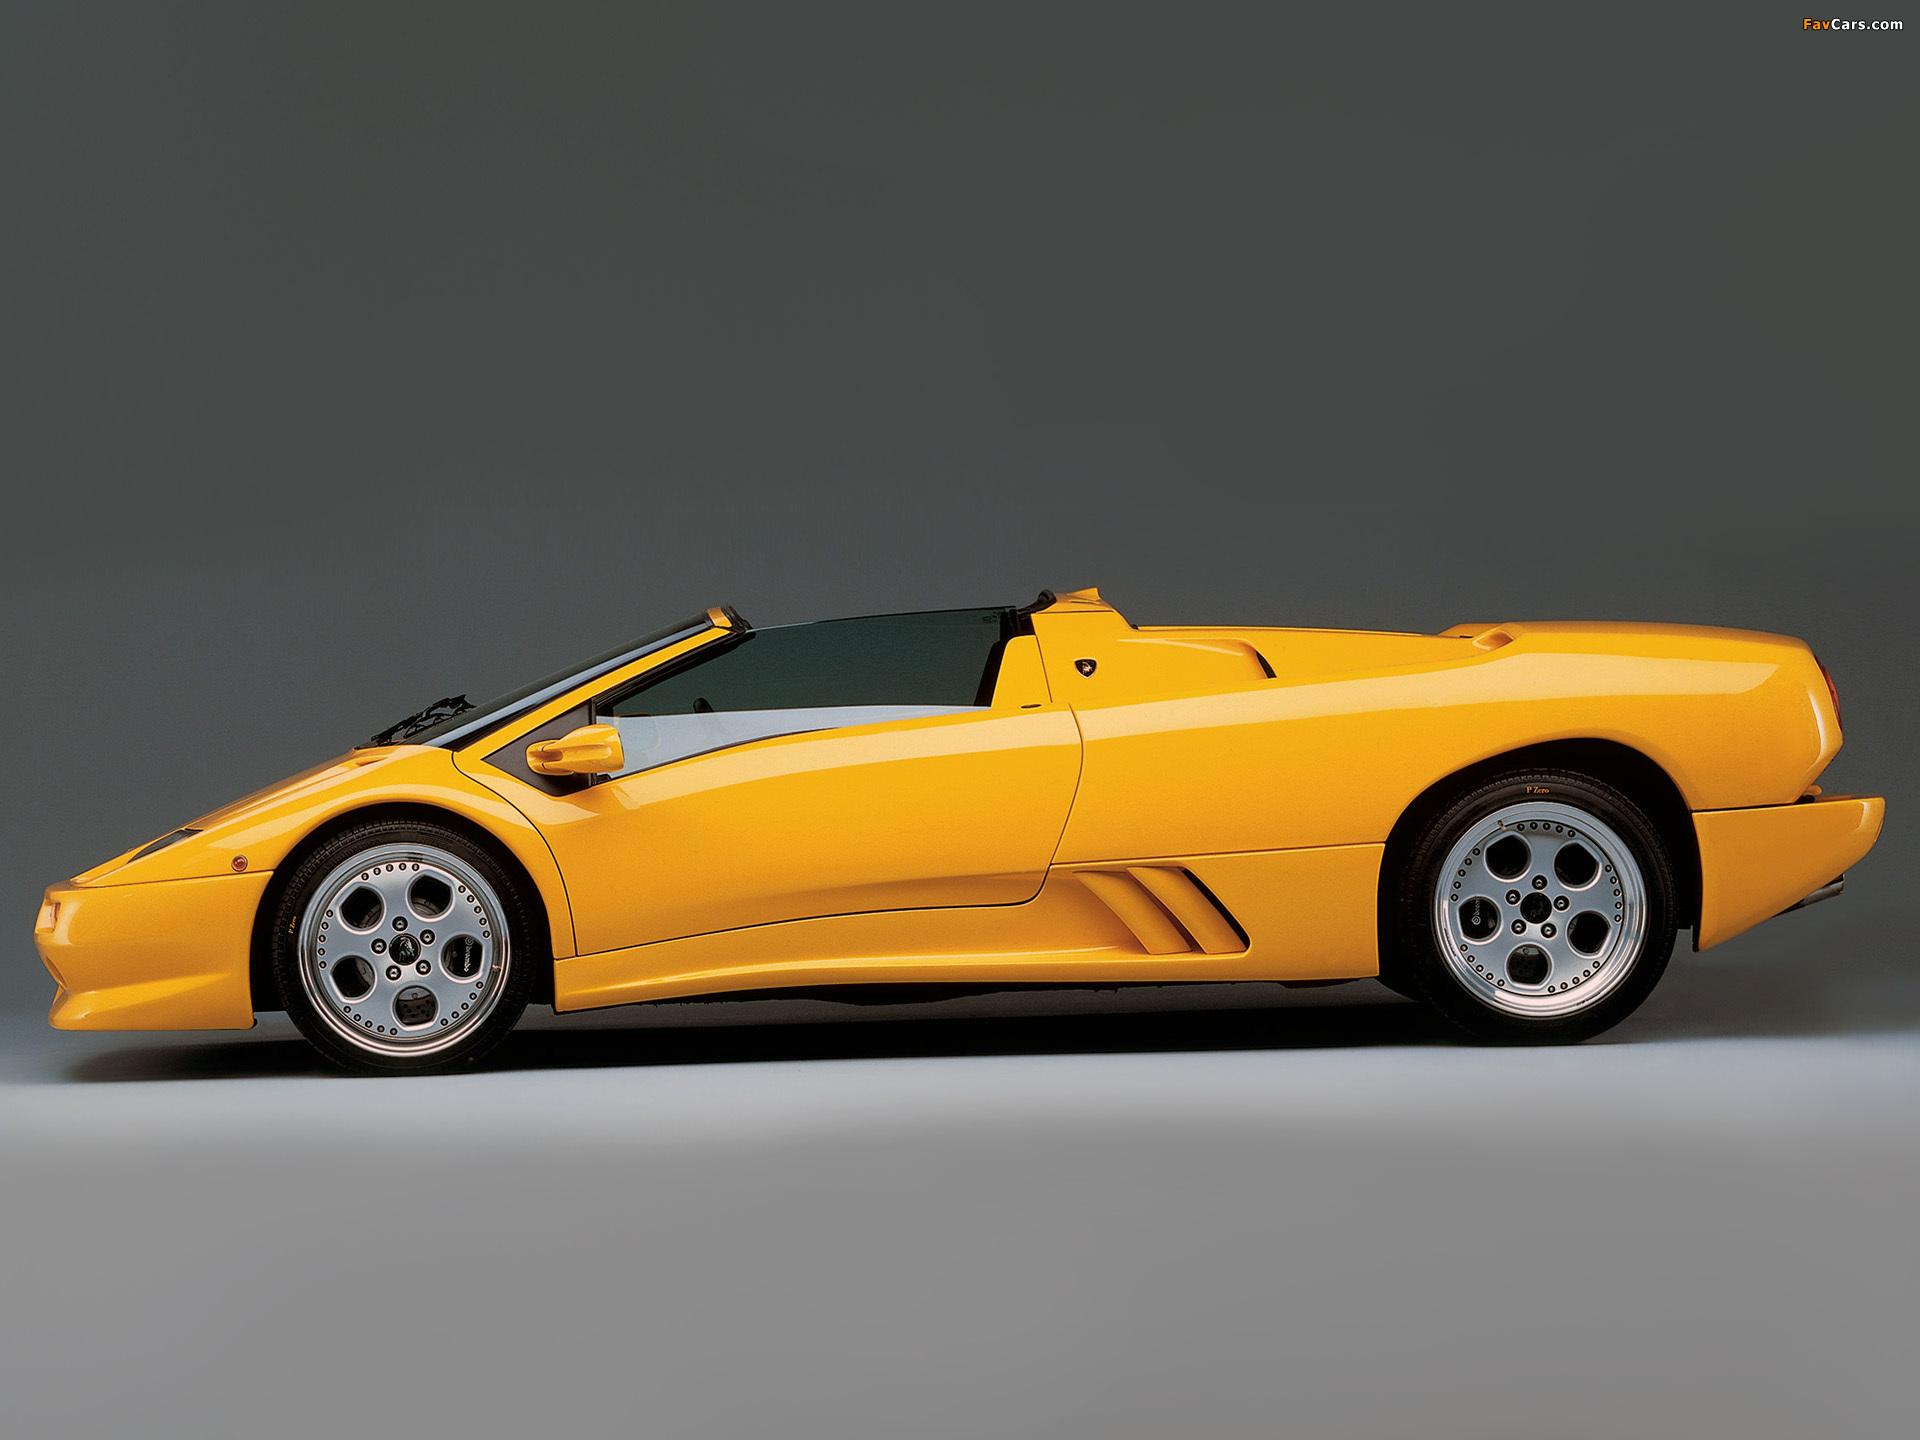 Lamborghini Diablo Vt Roadster Ver 2 1999 2000